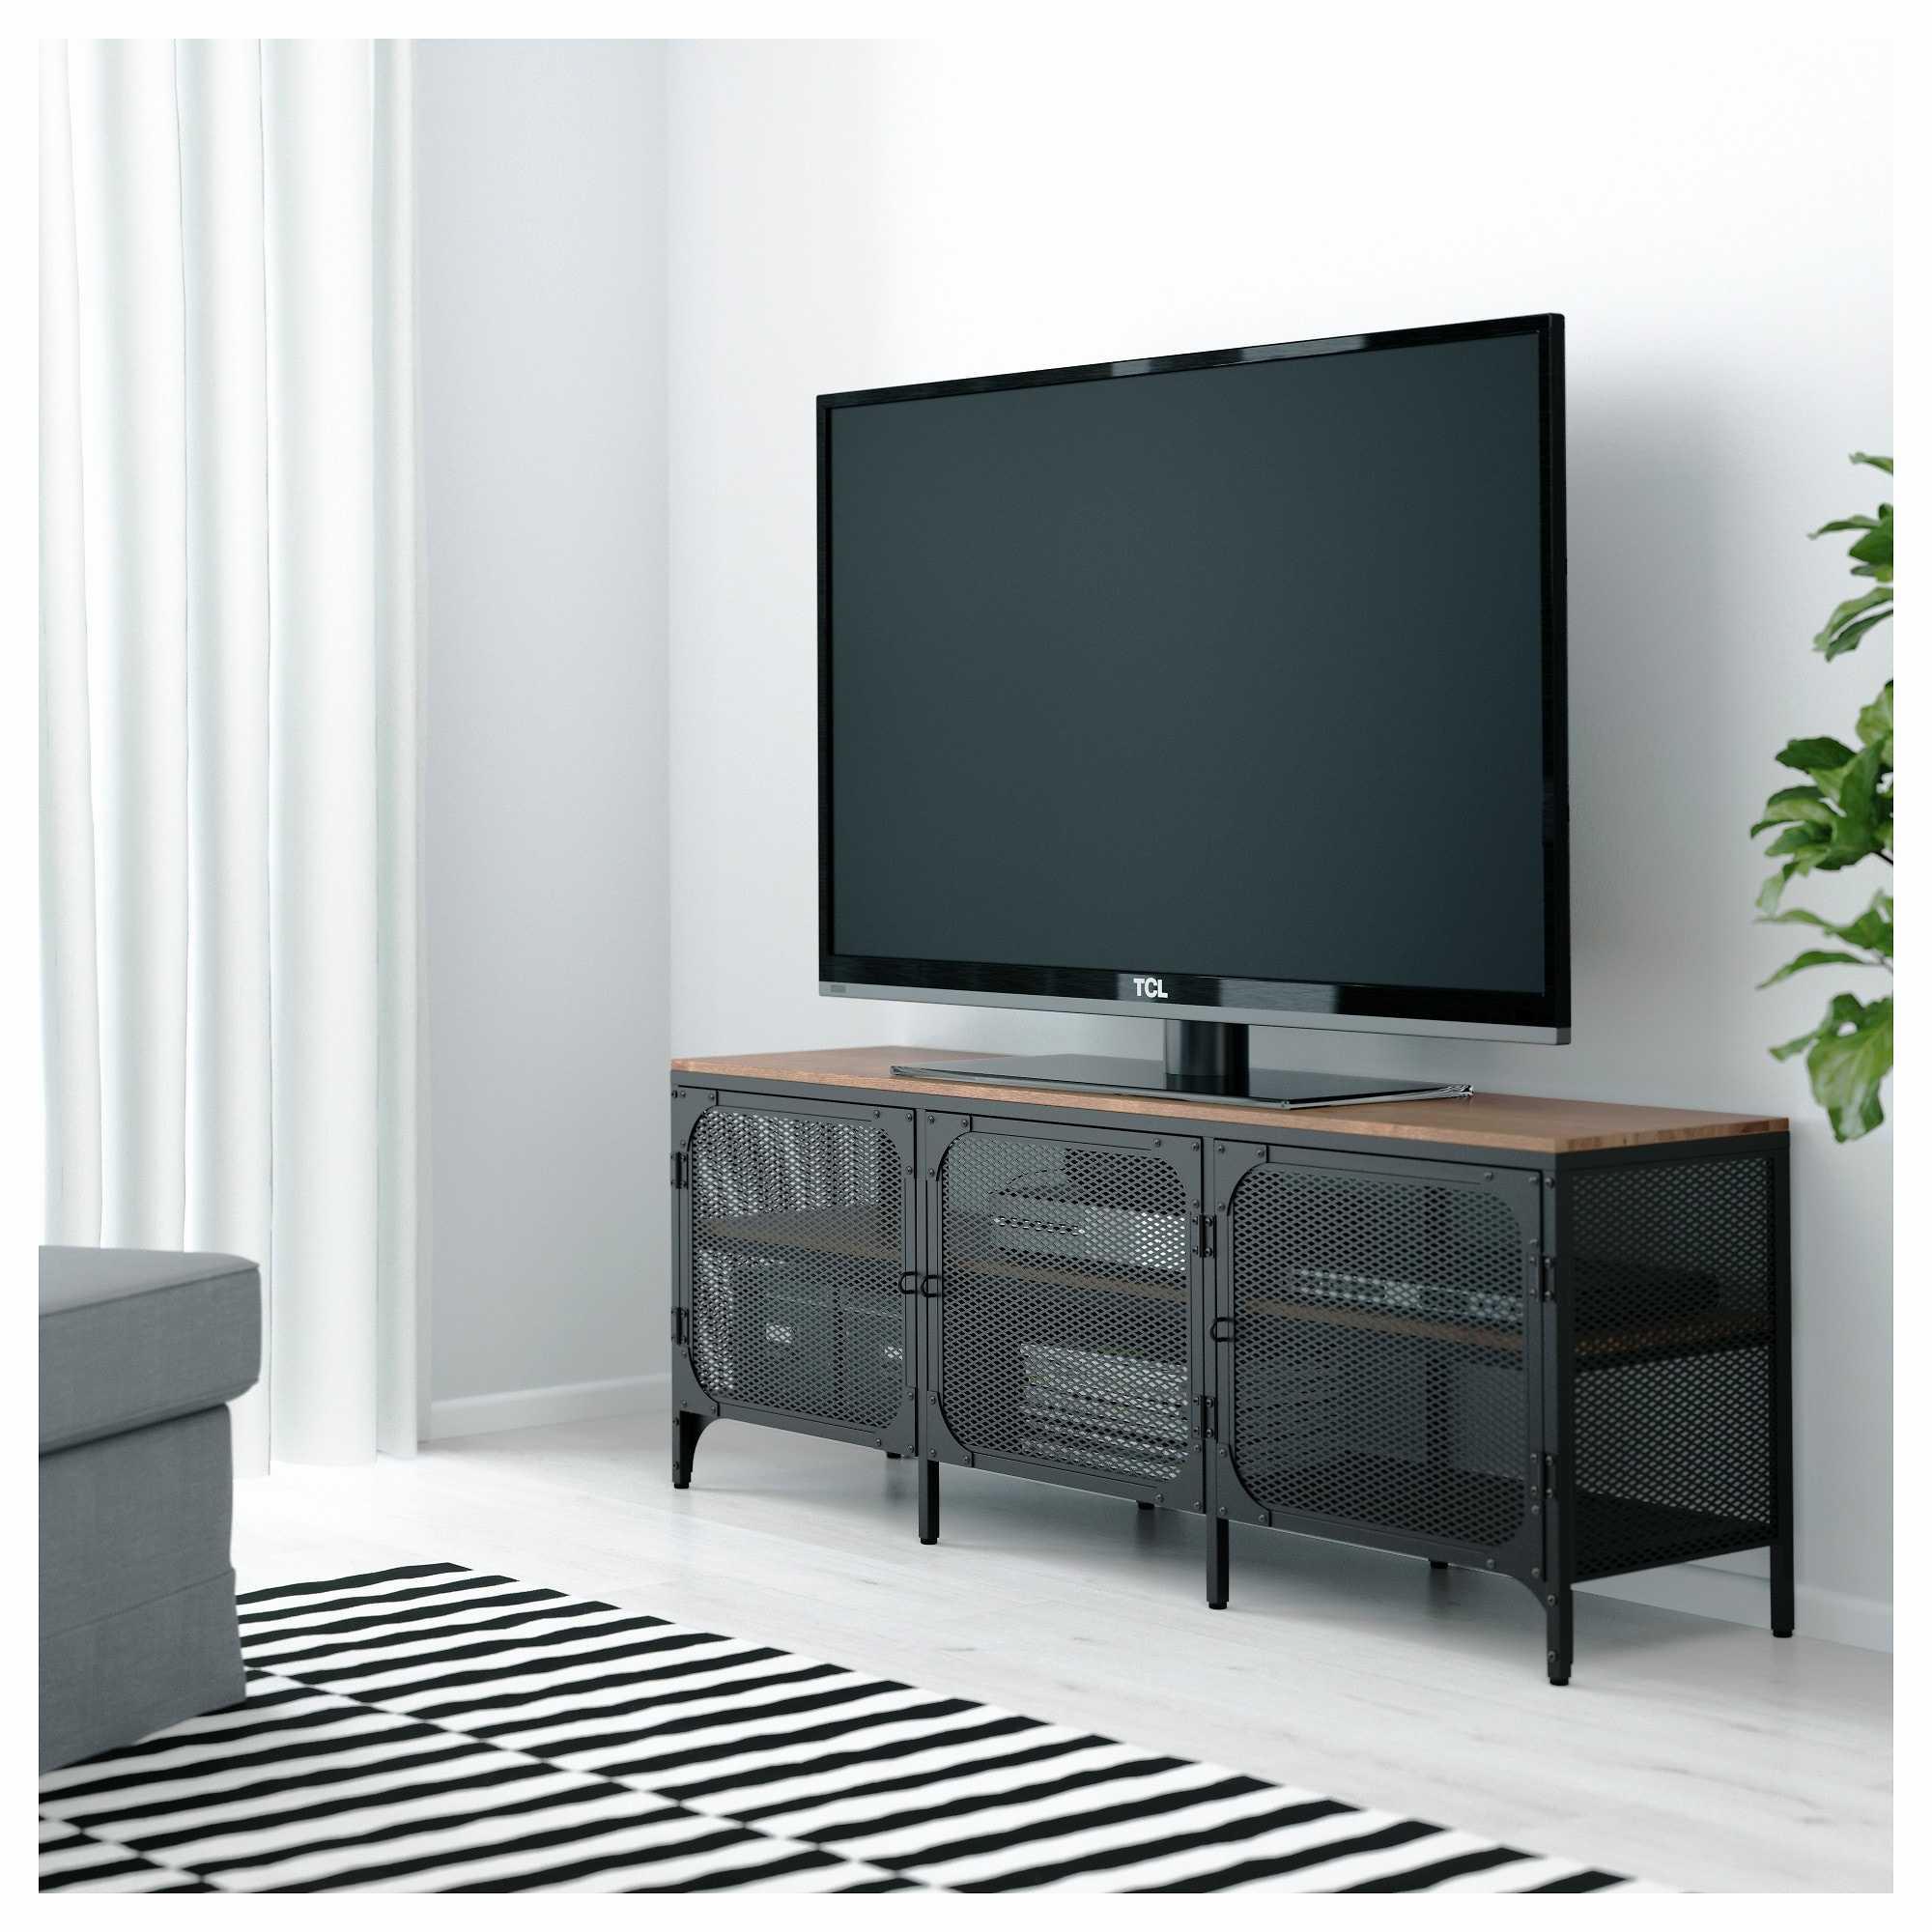 "Ikea Angers 49000 Adresse Nouveau Stock Meuble Tv Bureau Bibliotheque élégants Fj""llbo Meuble Télé Ikea – La"